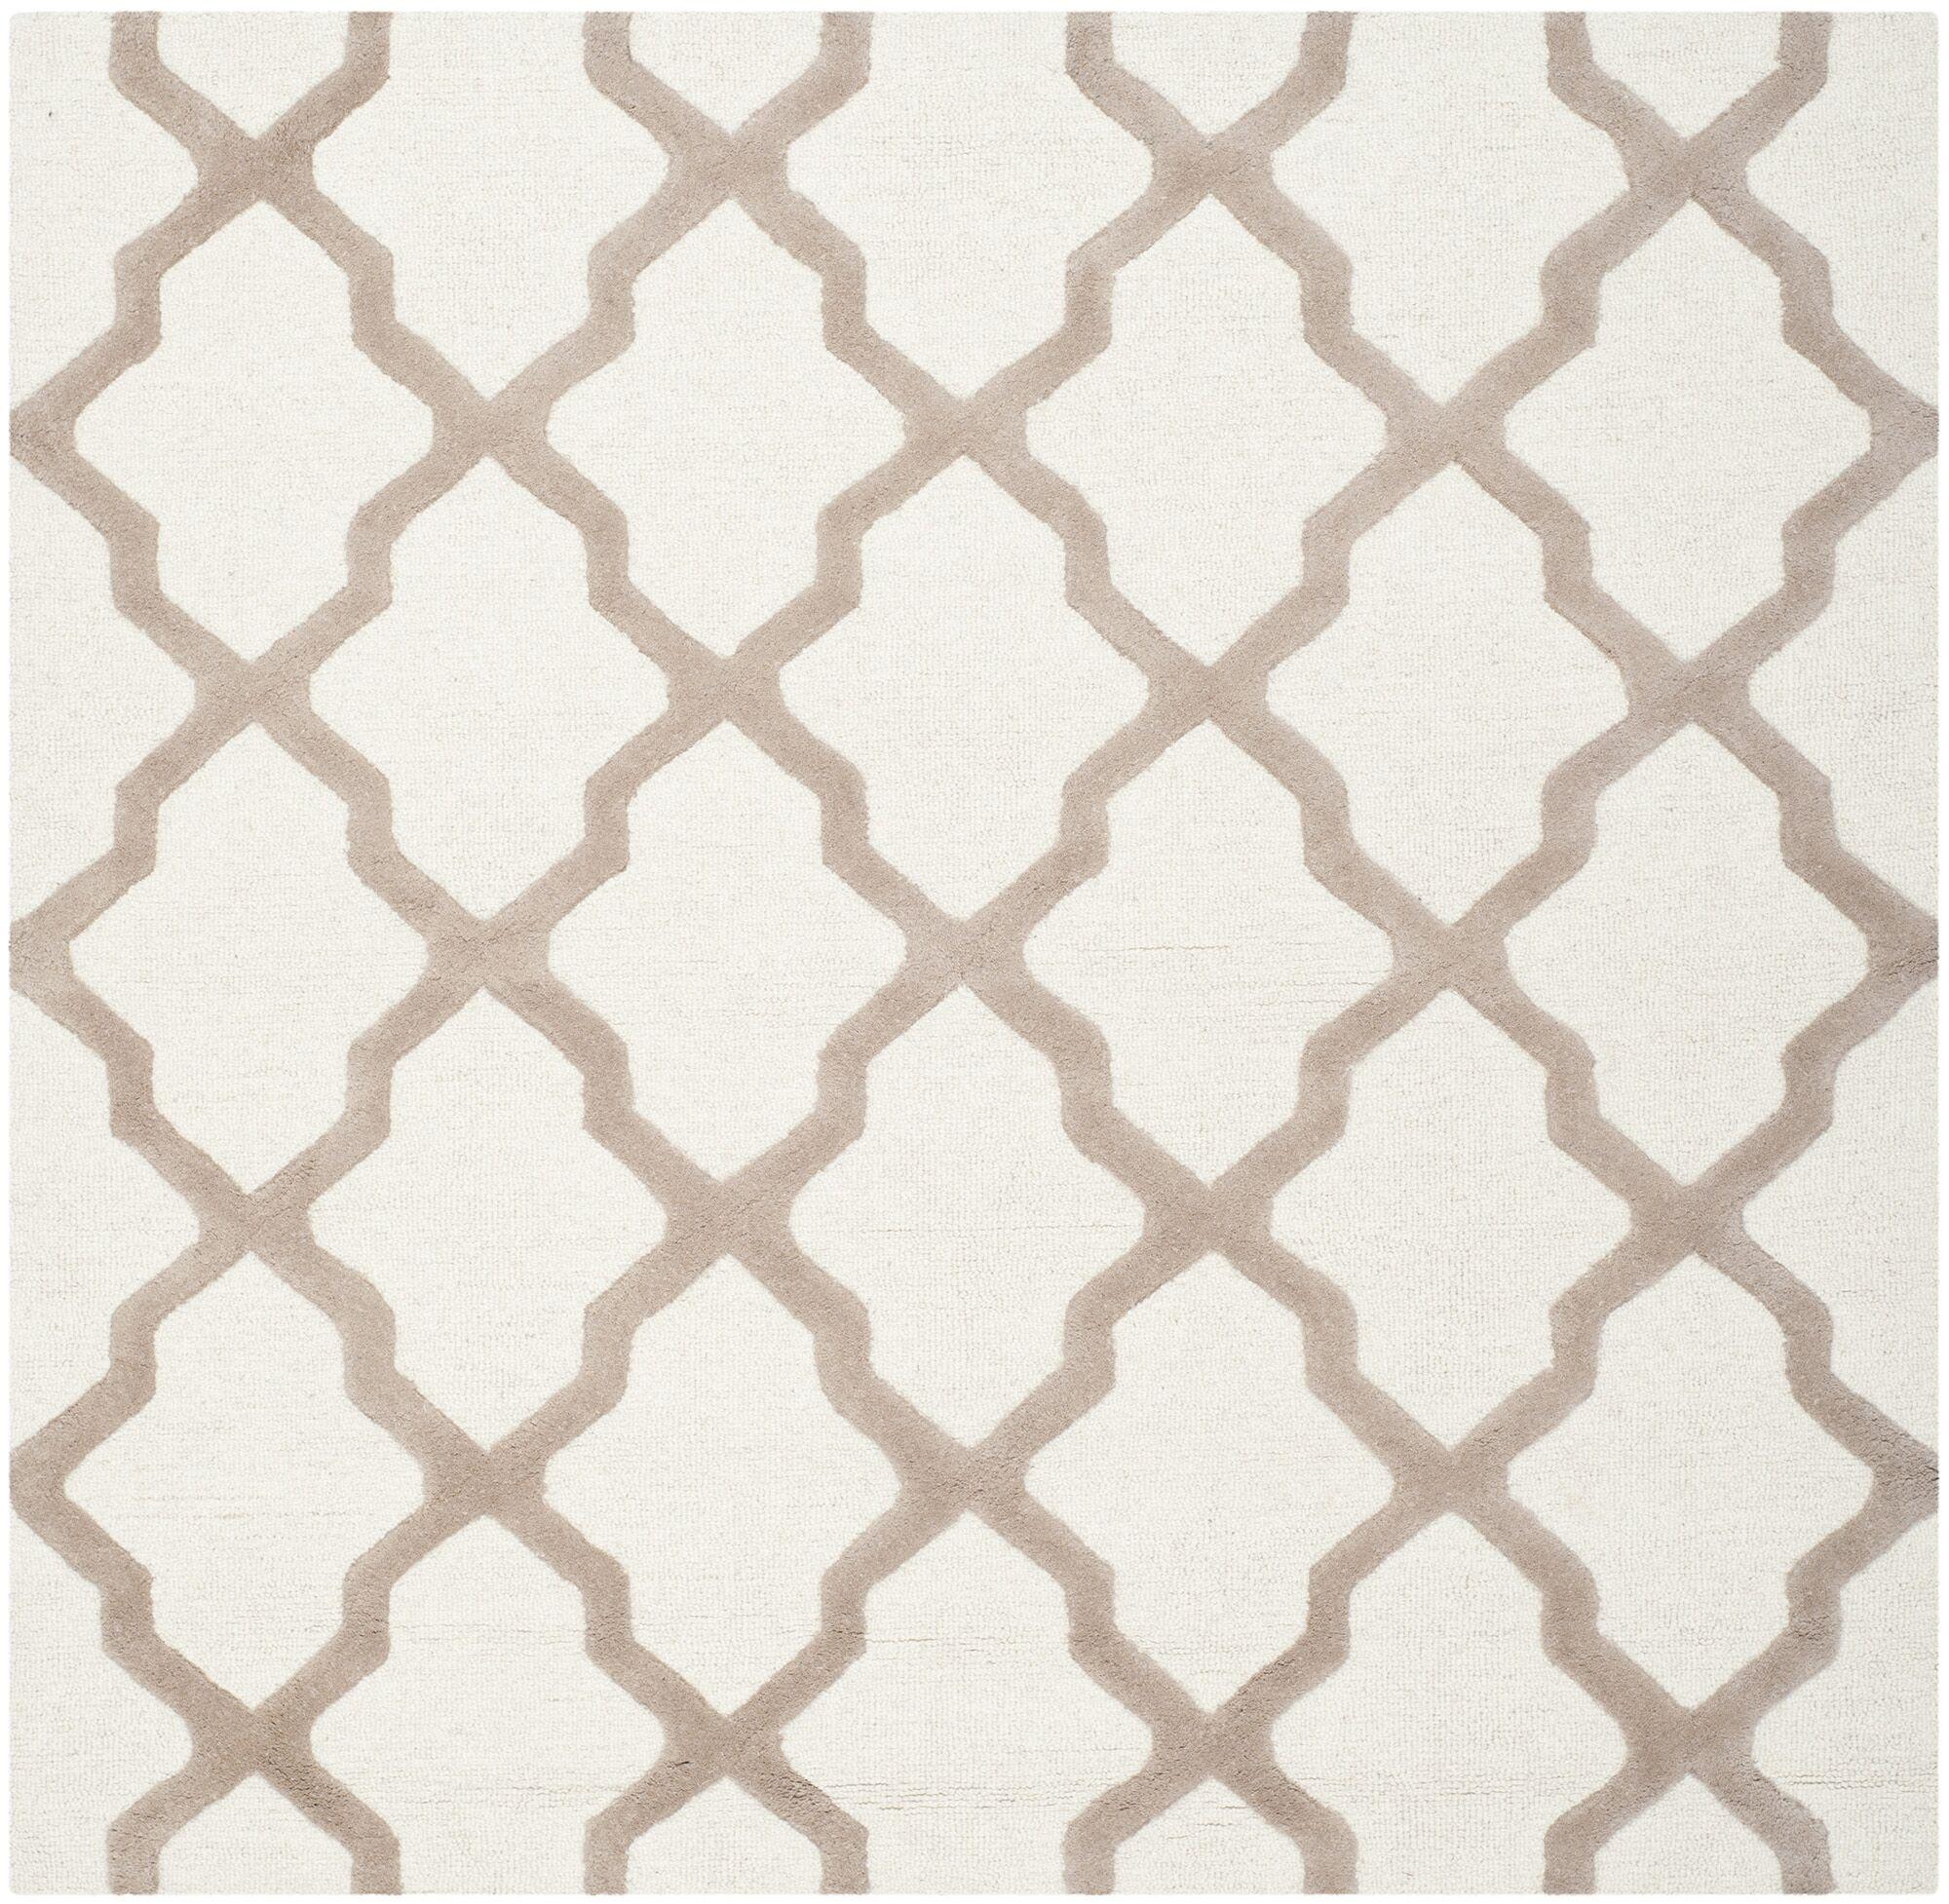 Charlenne Hand-Tufted Wool Ivory/Beige Area Rug Rug Size: Square 6'